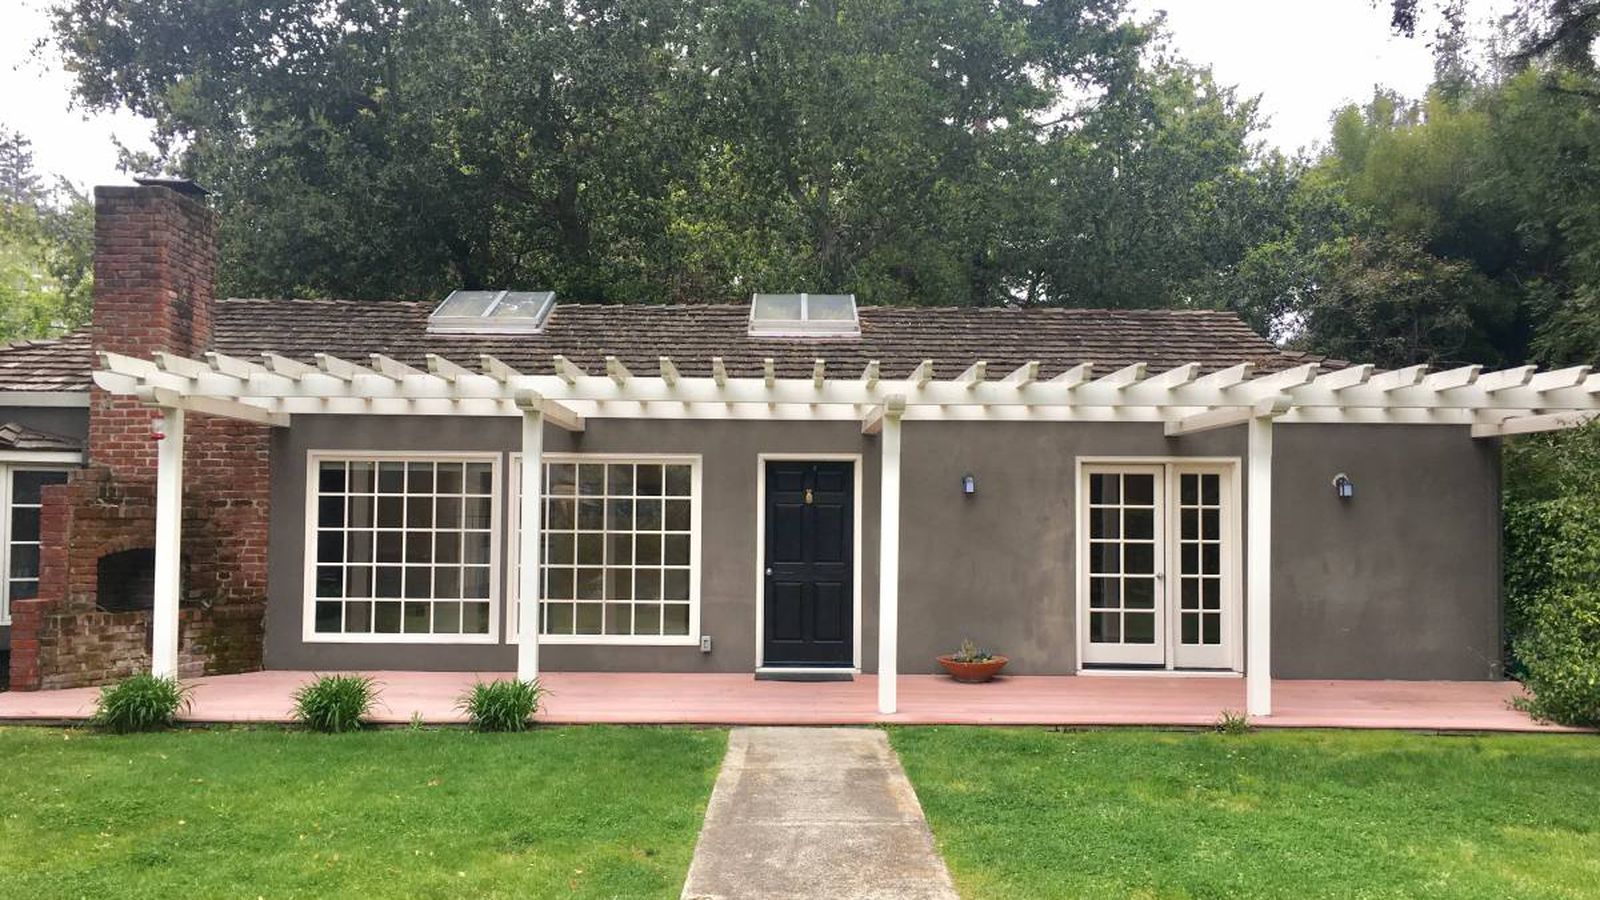 Craigslist Apartments For Rent In San Jose